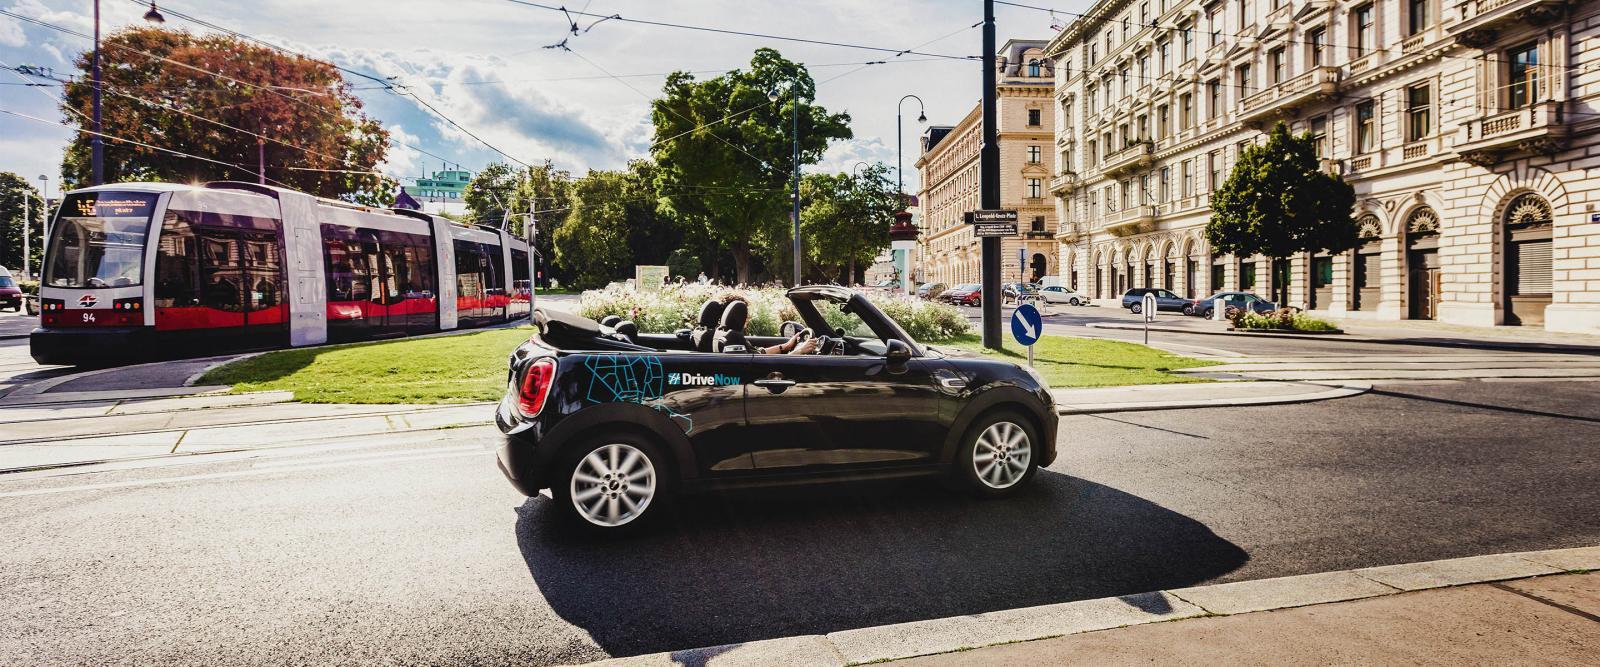 drivenow_carsharing_wiener_linien_cabrio